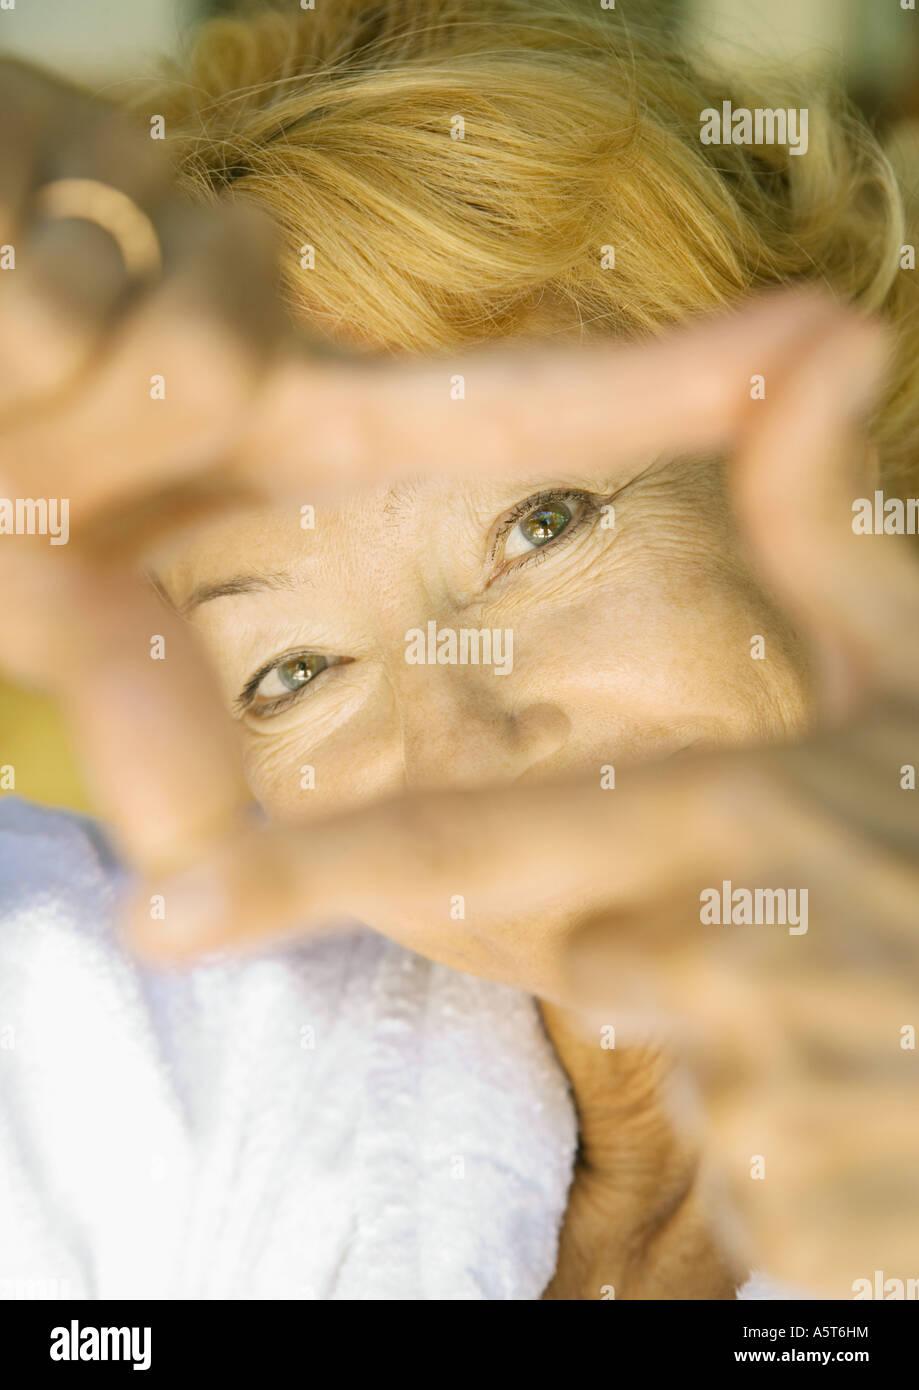 Senior woman looking at camera through finger frame - Stock Image